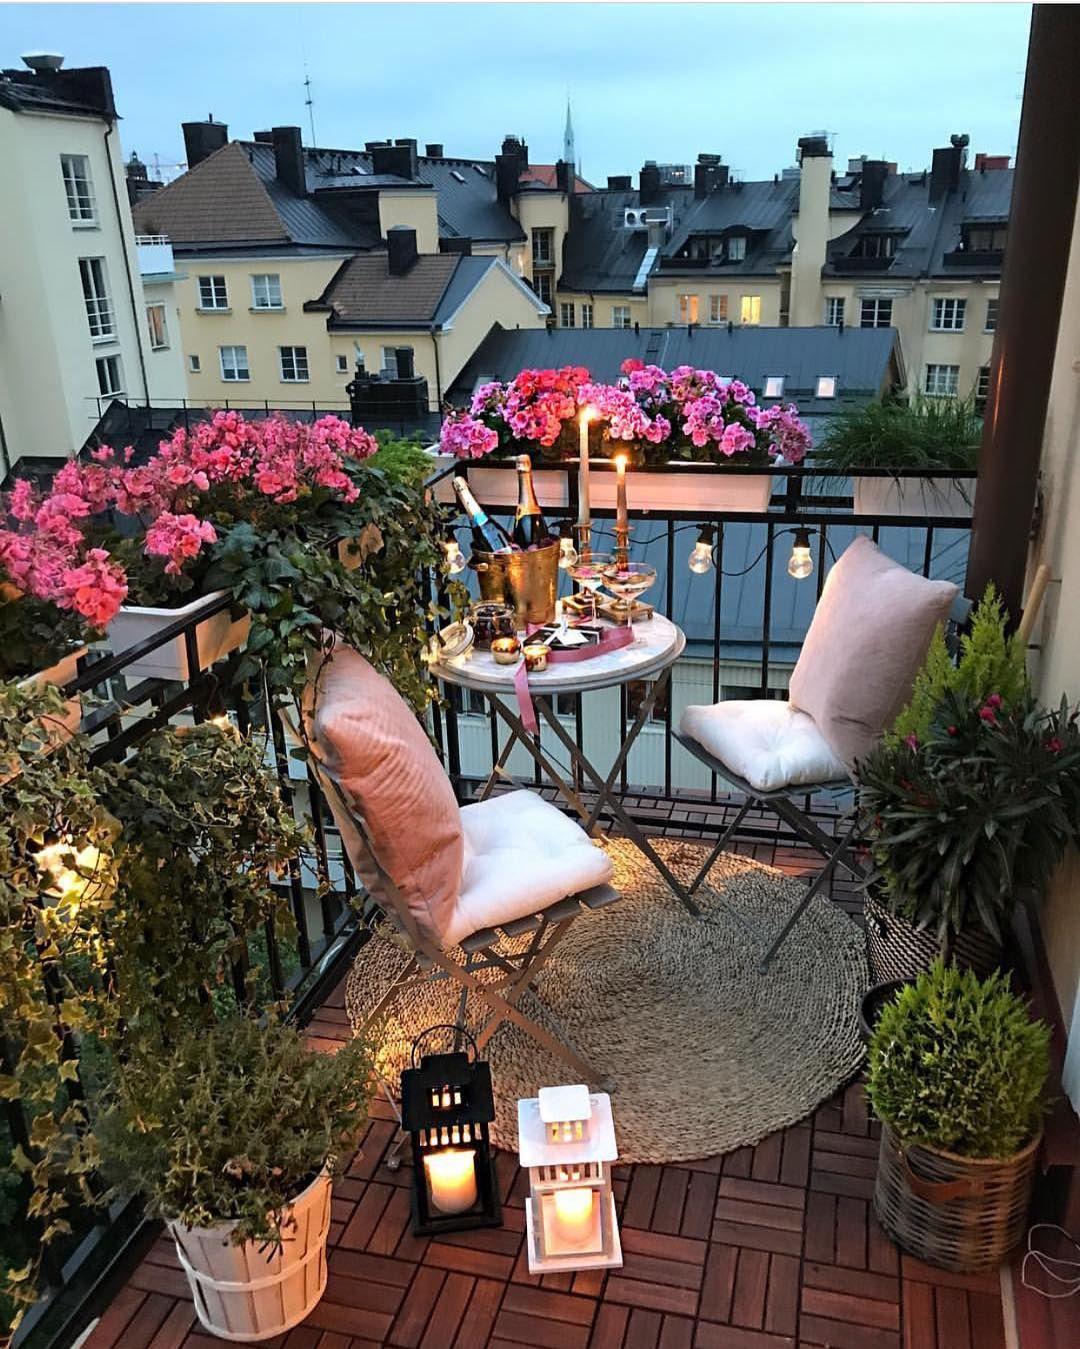 Sunset Garden Apartments: @parvinsharifi #balcony #sunset #terrace #romantic #uterom